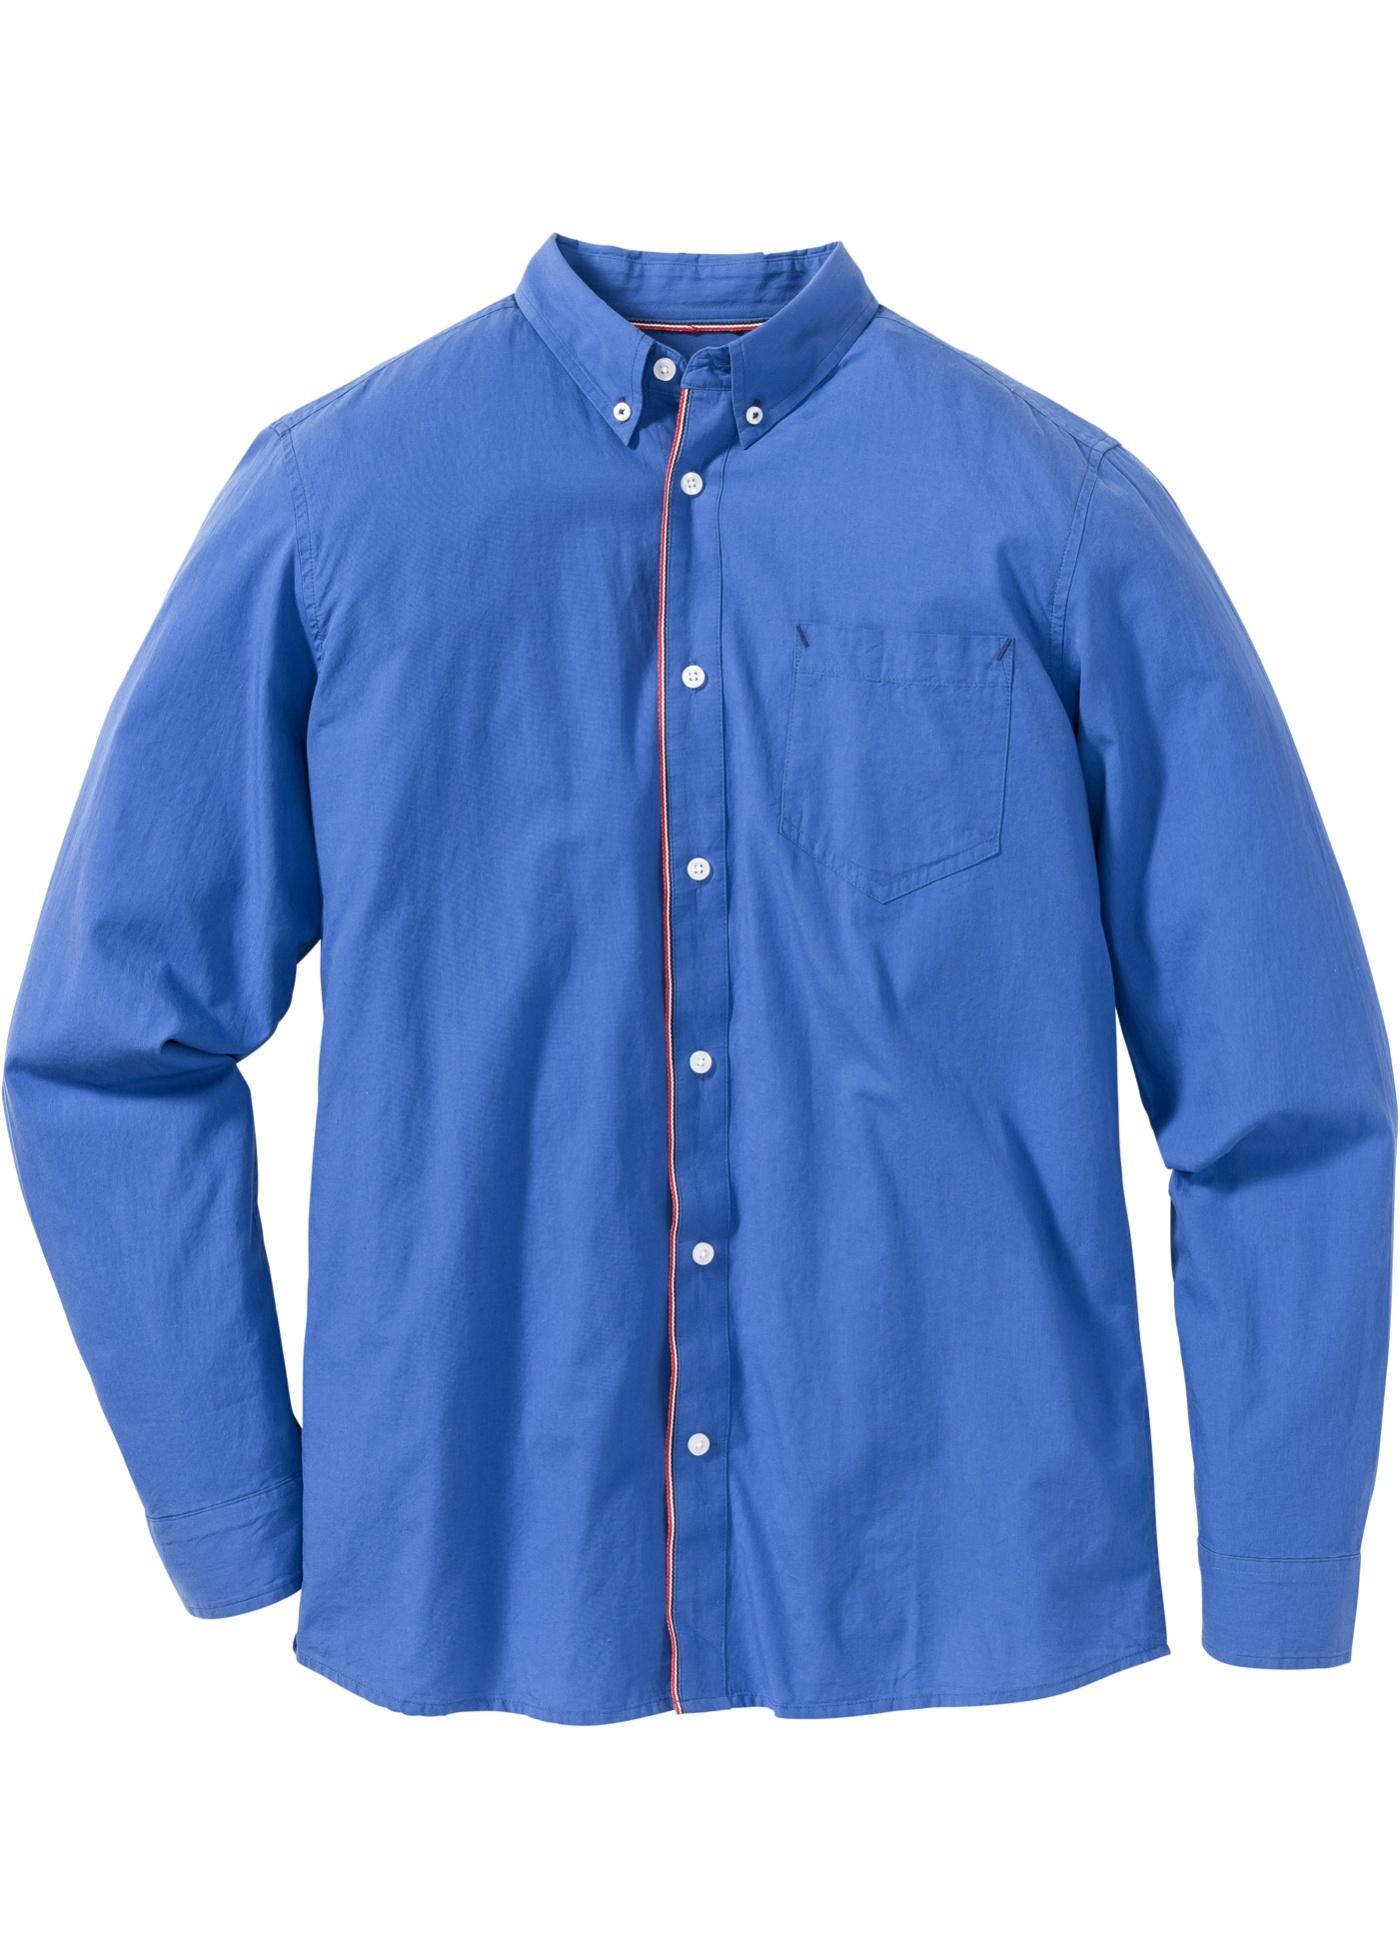 a2b3fb03968 Kosile woodcutter s dlouhym rukavem modra levně